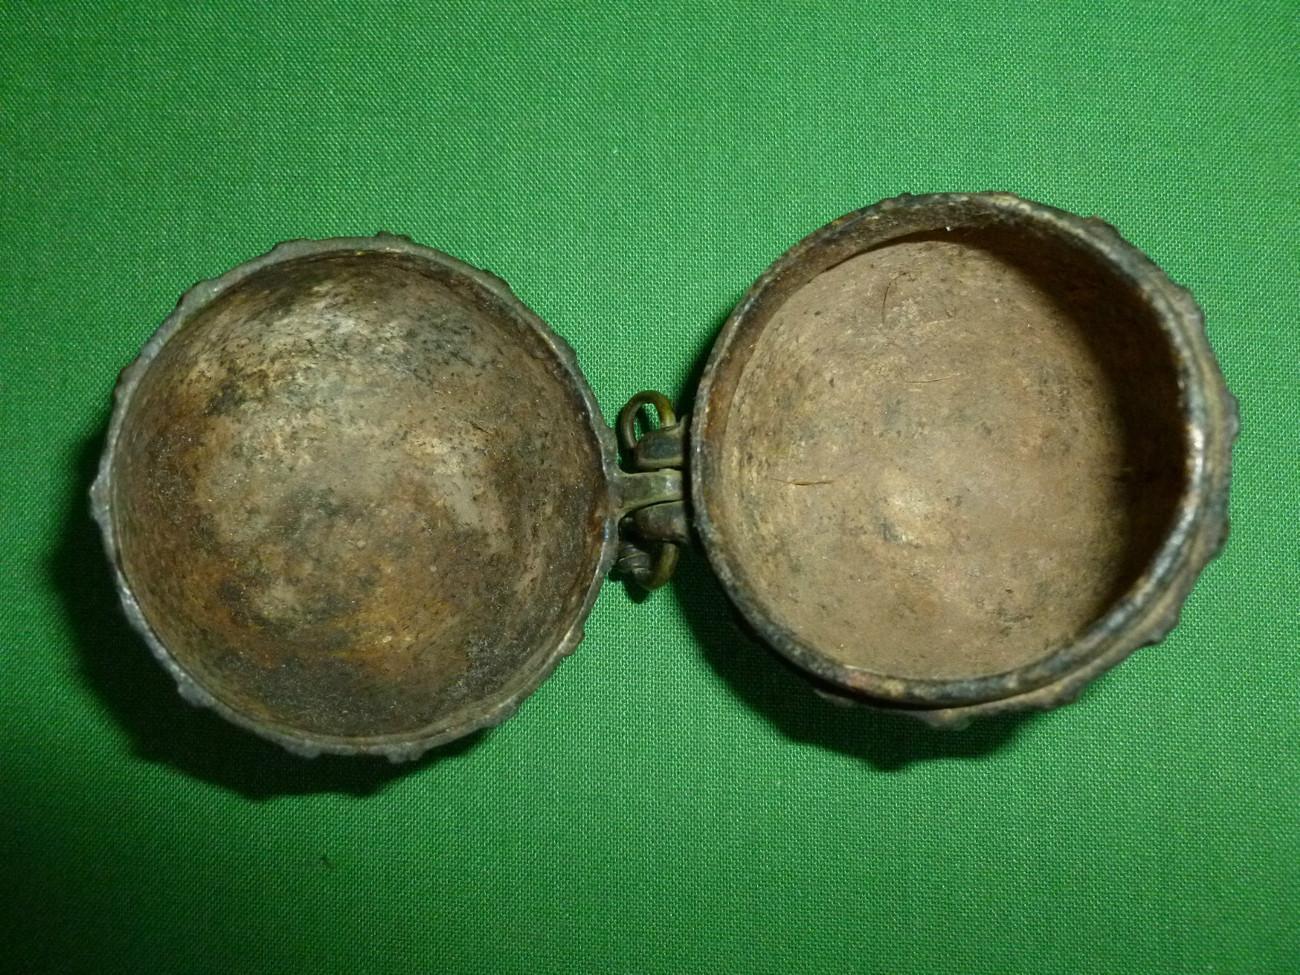 Antique Indian Bronze Betel Nut Box Circa 1860 - 1870